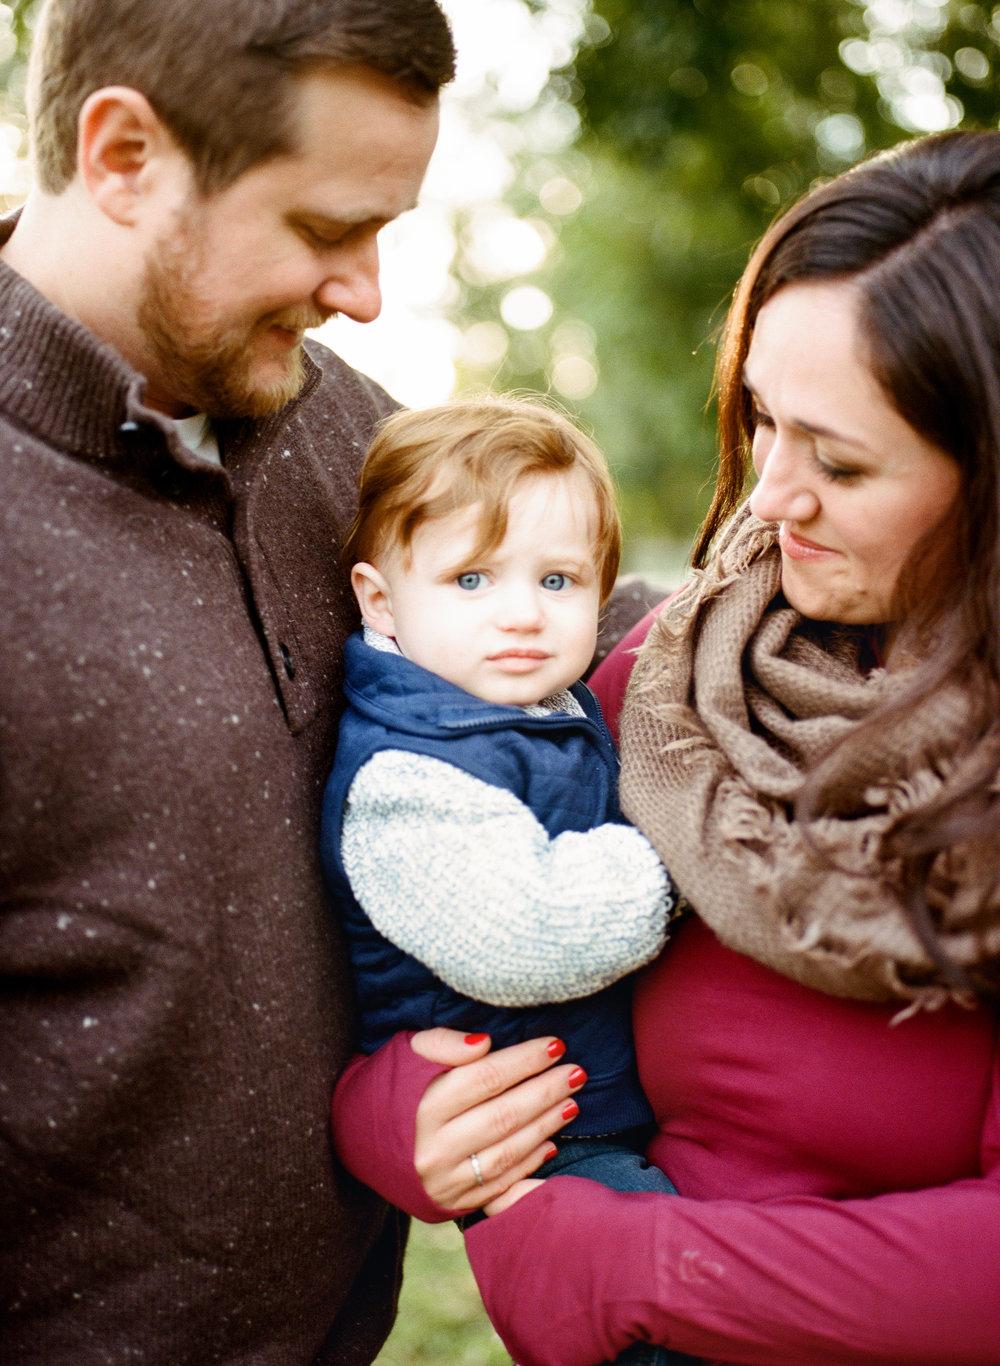 lifestyle-family-photographer-film-historic-oak-view-county-park